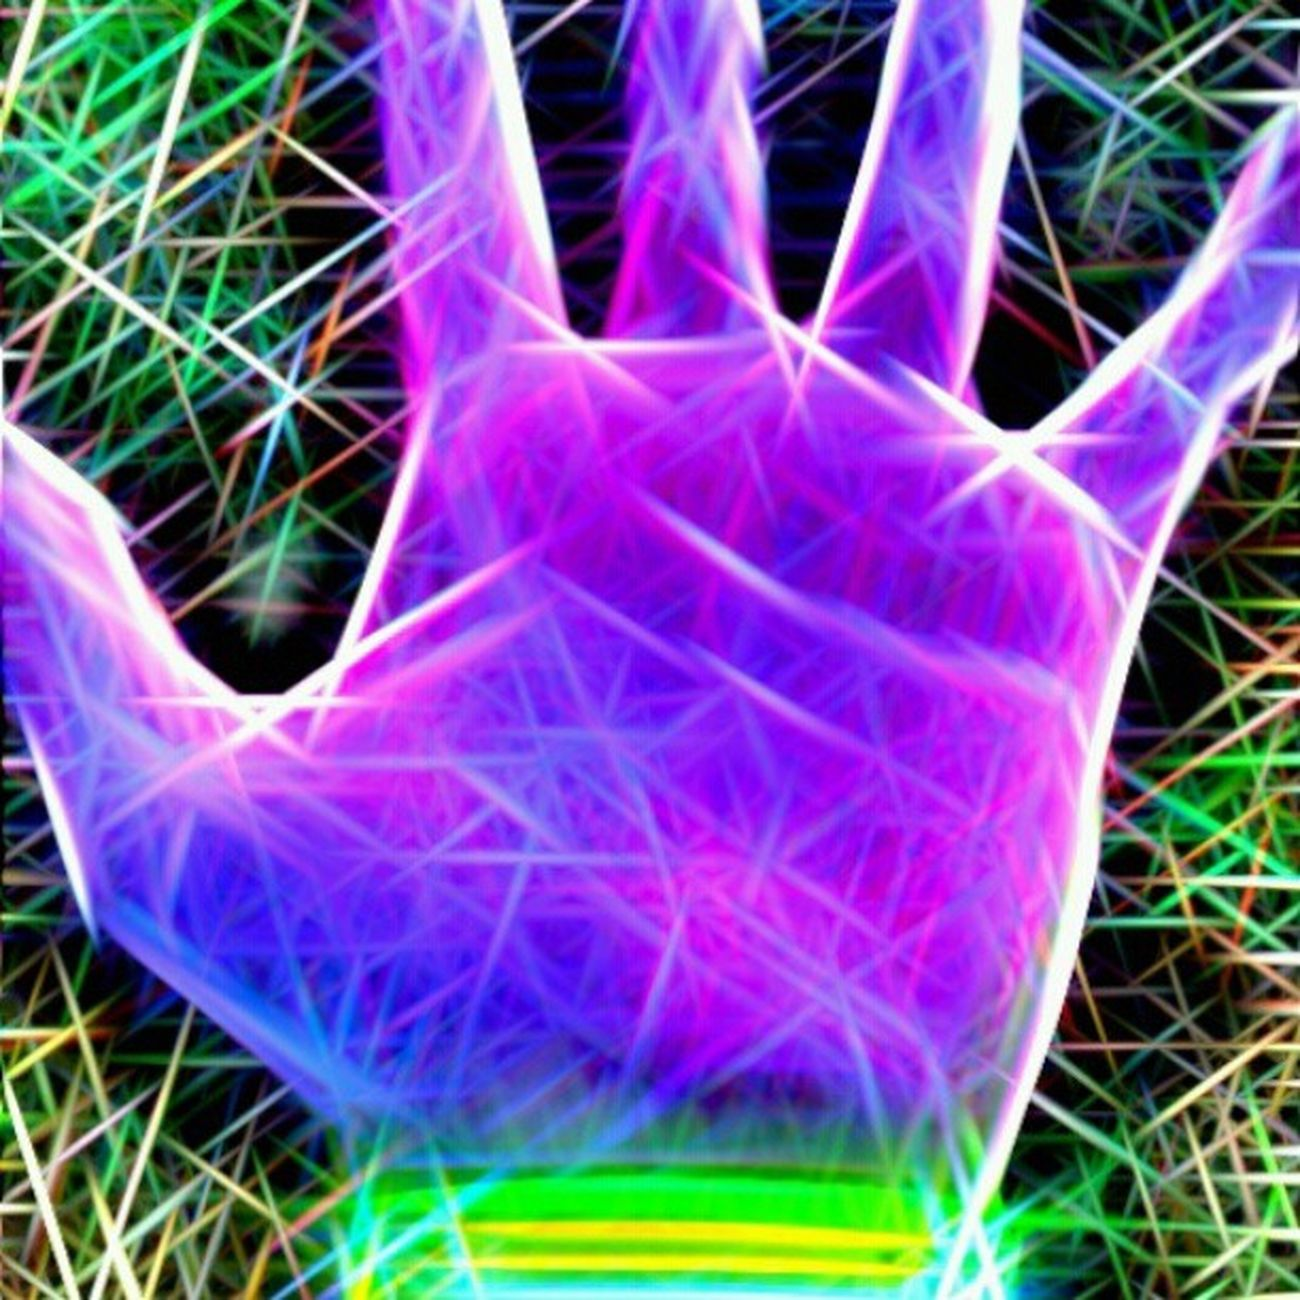 Filter Hand Fun Doin instafamous